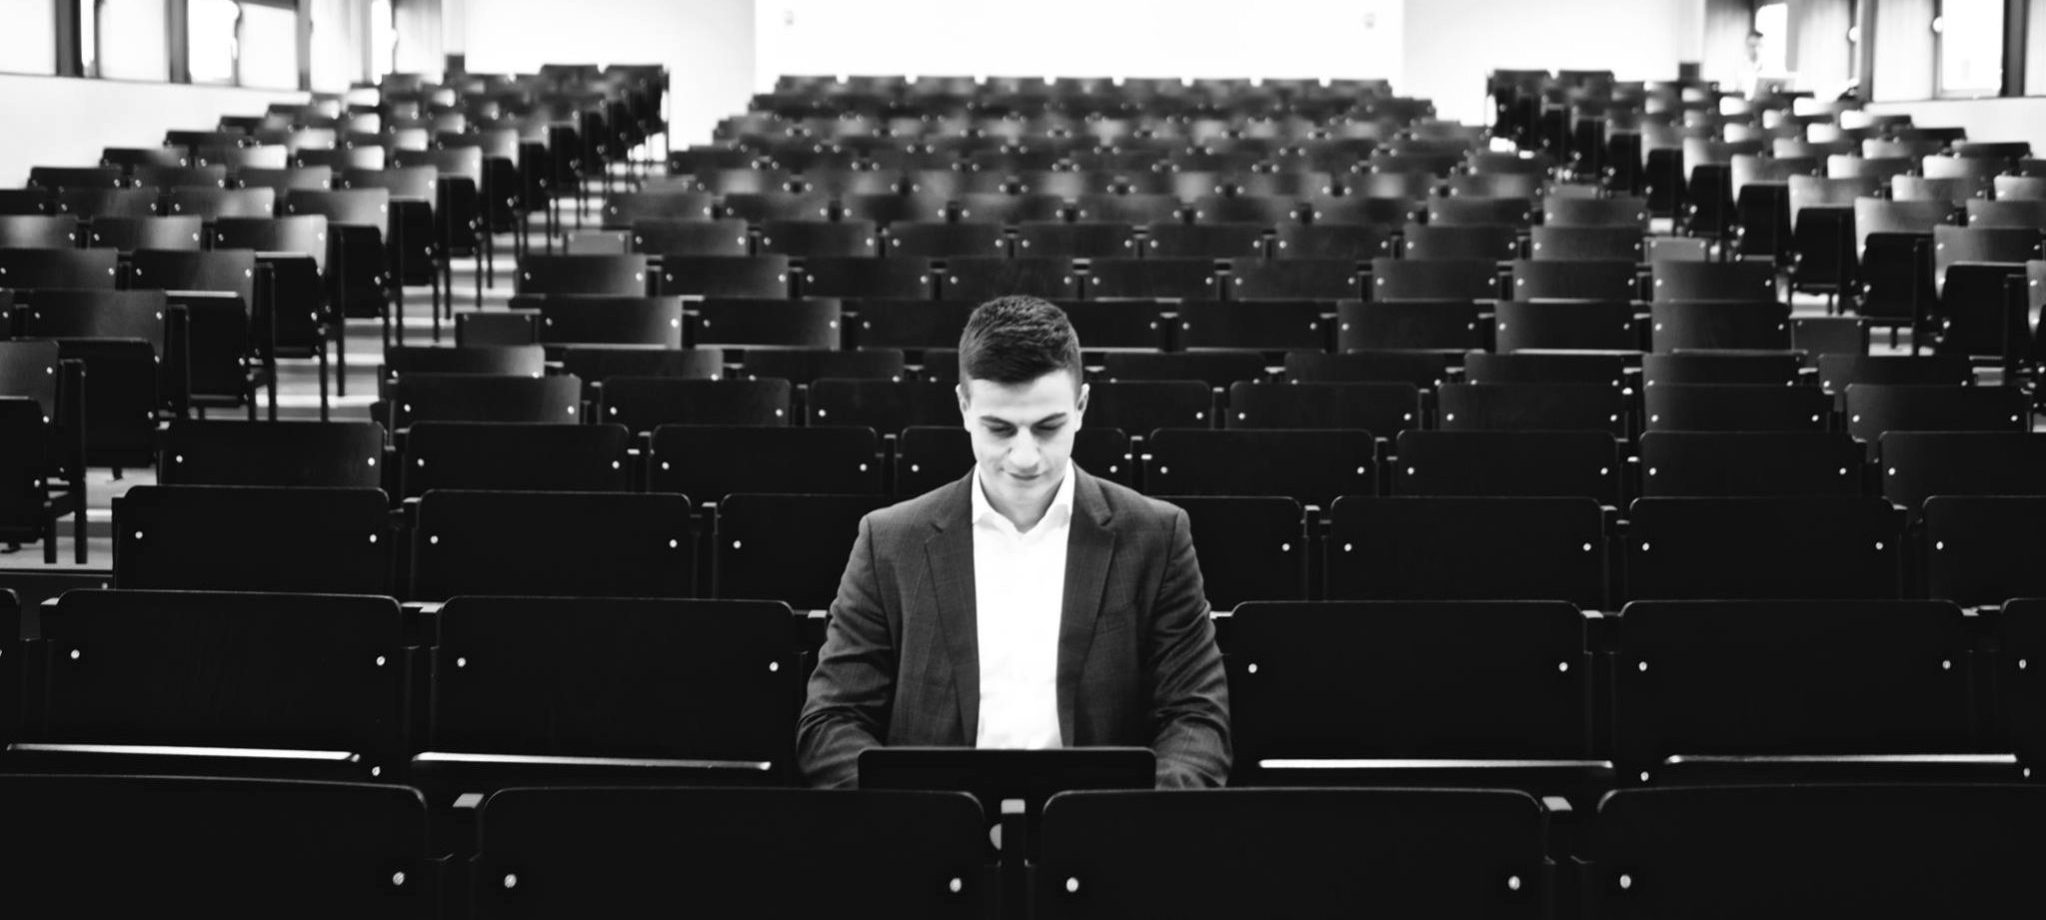 LXP - Lifexpe - Belgian Entrepreneur Fearless Belgian Student Shares His Entrepreneurial Journey